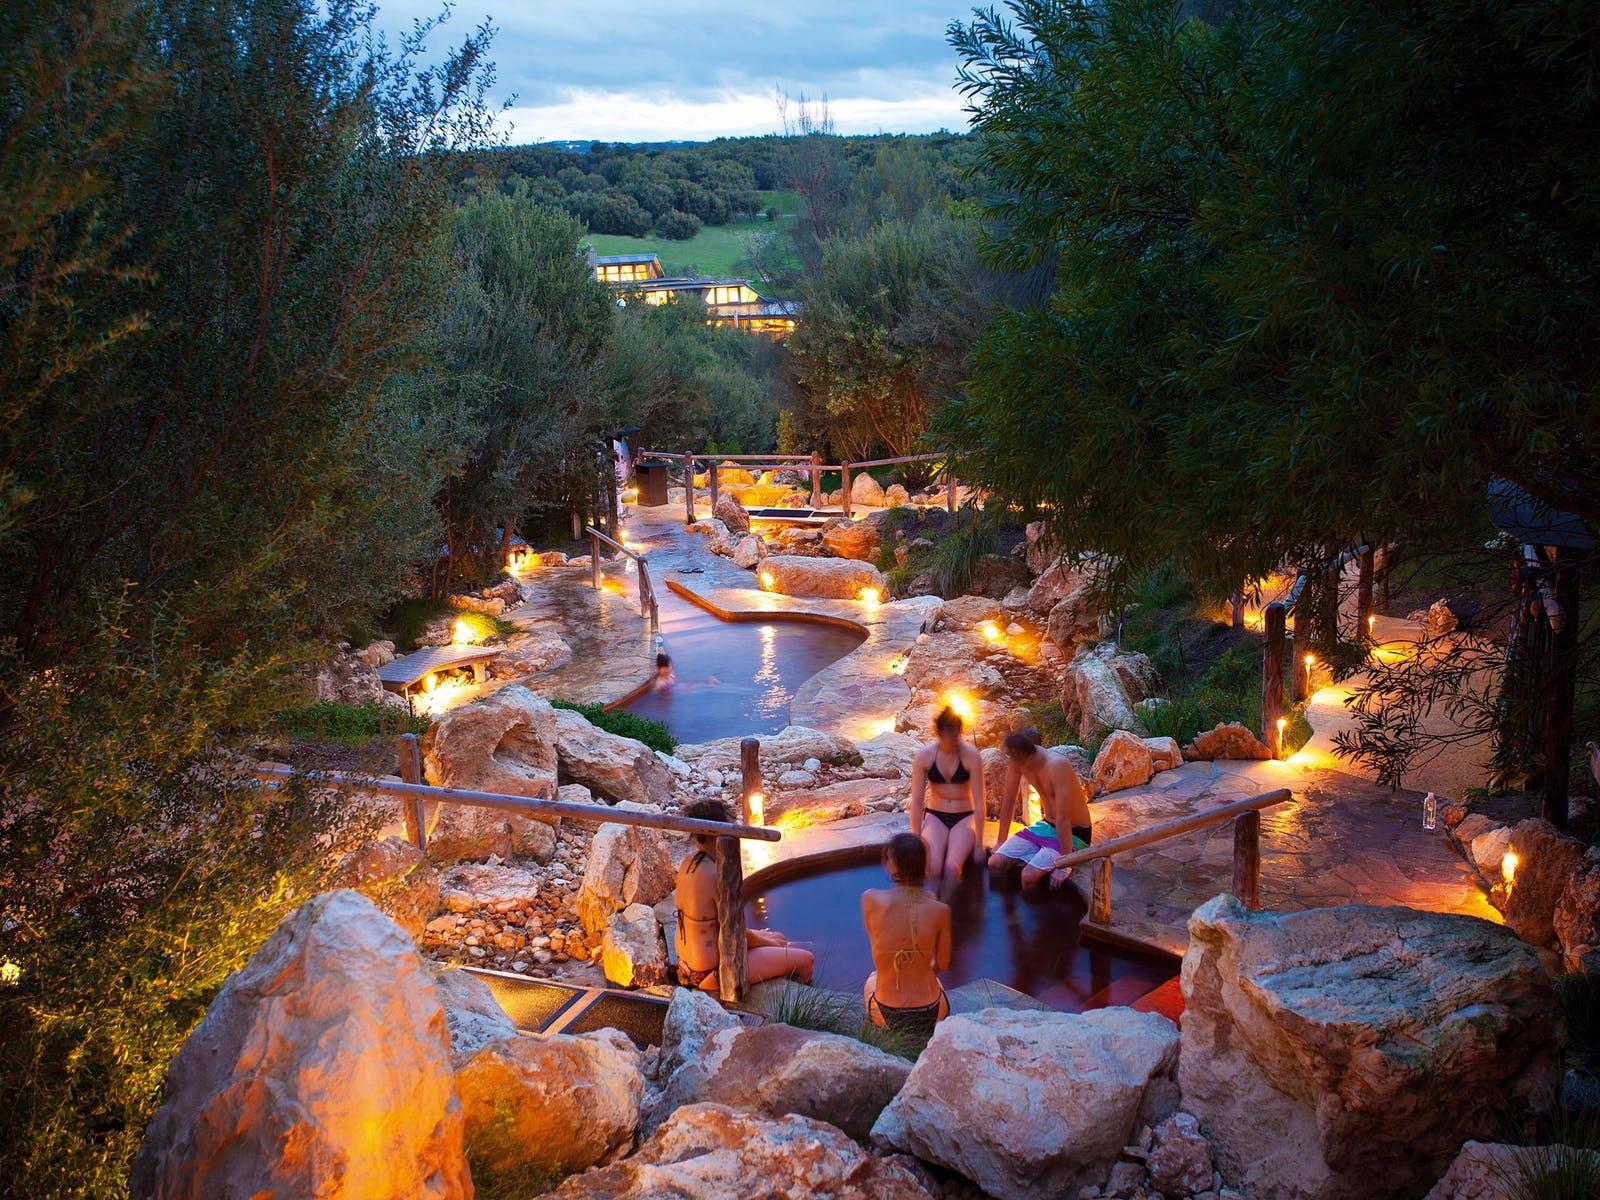 Peninsula Hot Springs Private Tour